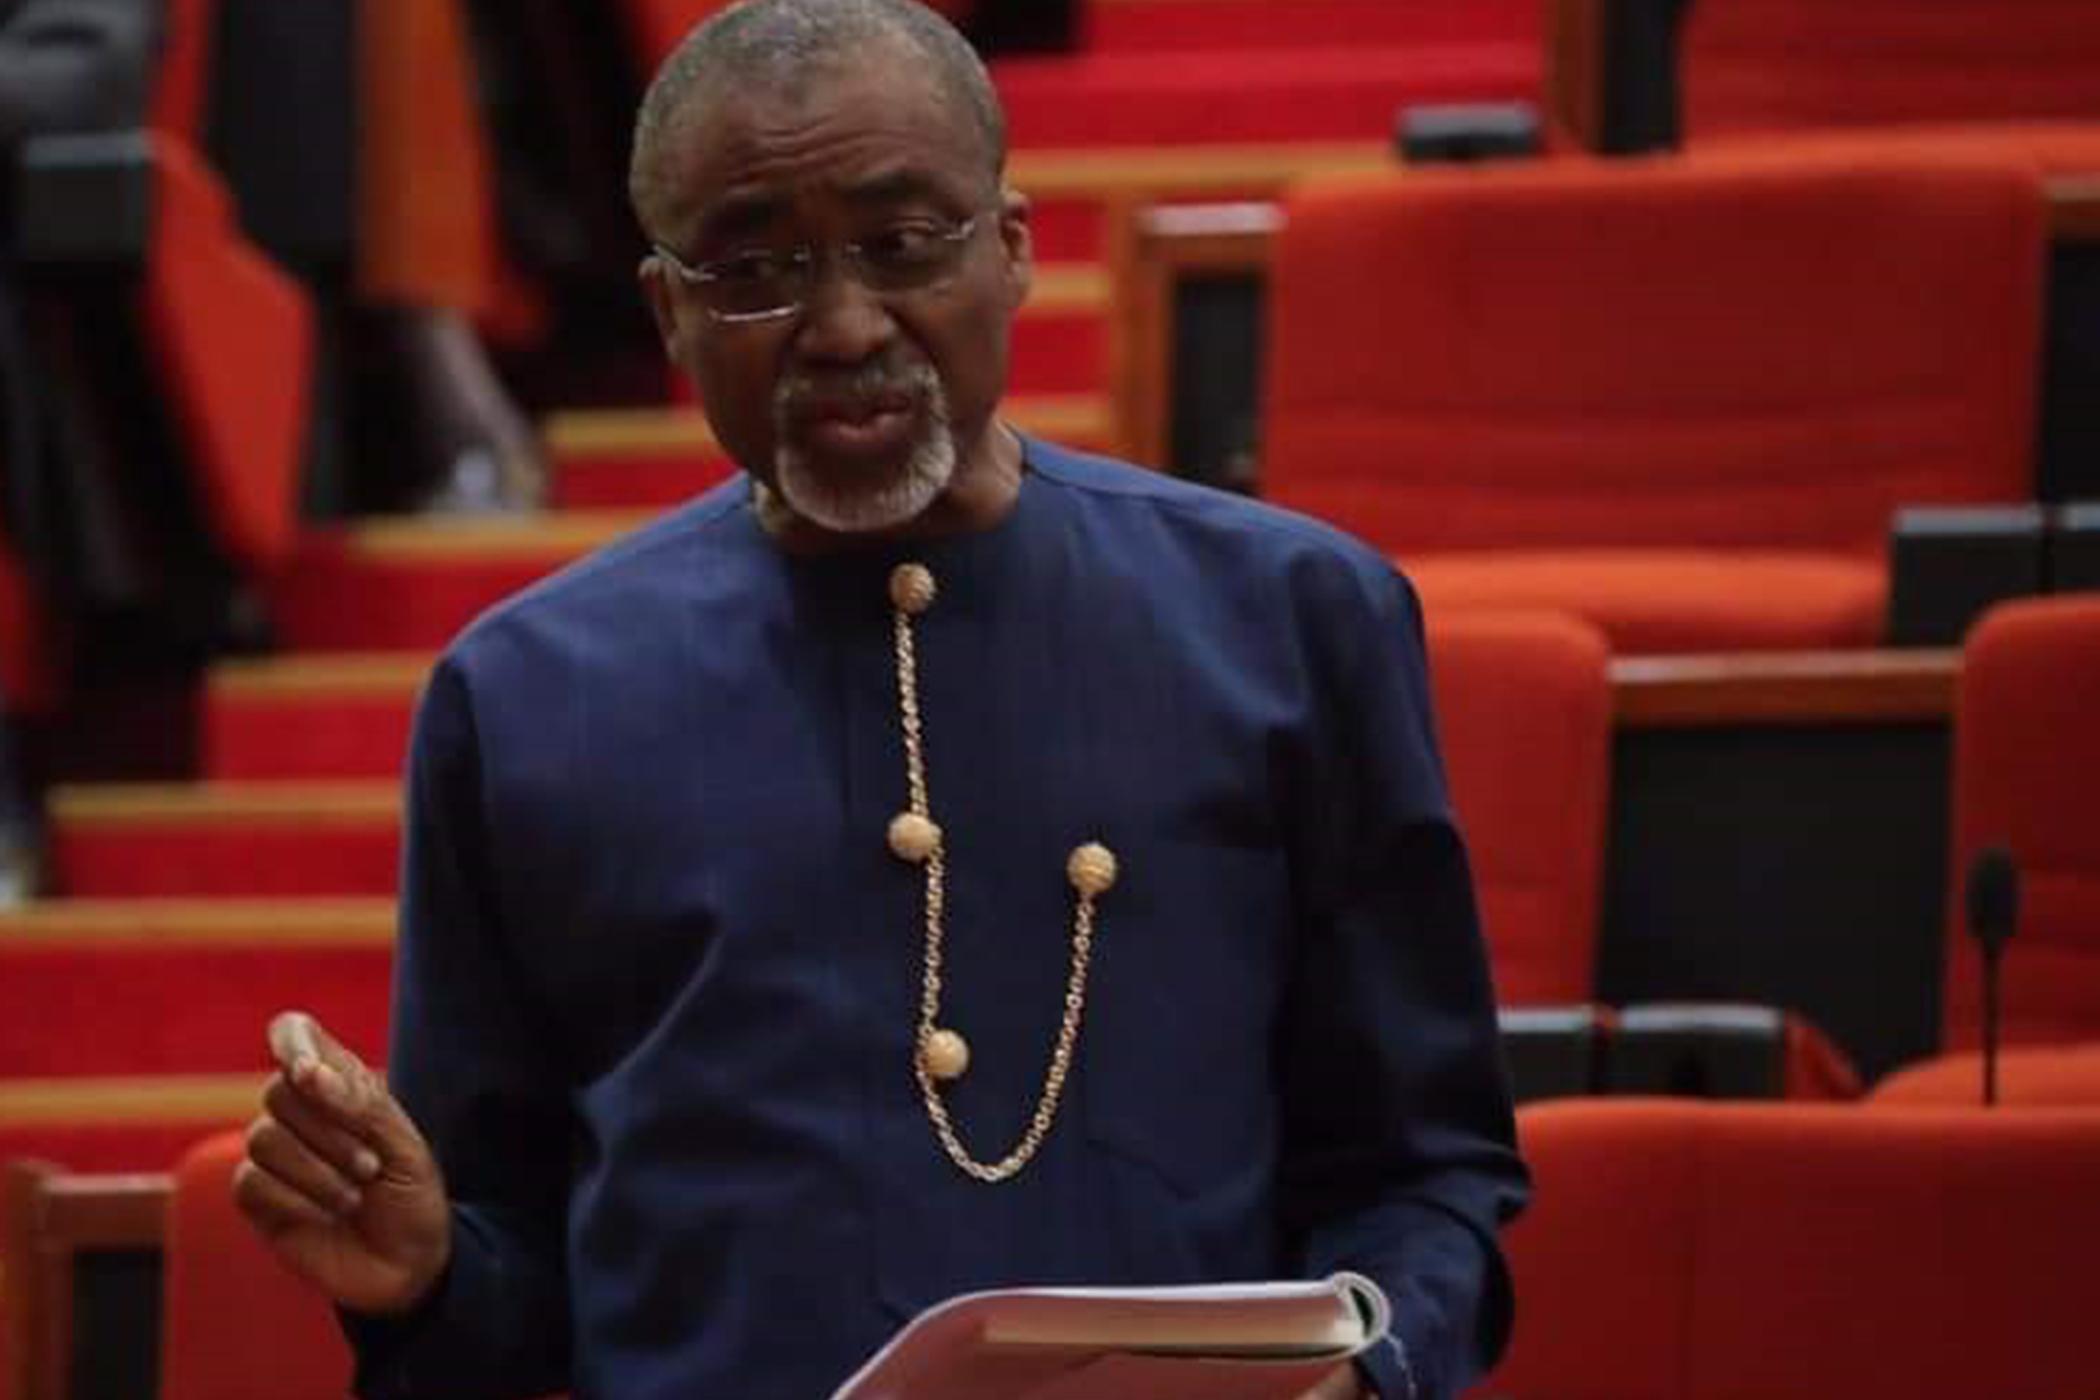 Ndigbo have been marginalised for so long, we demand equal treatment — Senator Enyinnaya Abaribe